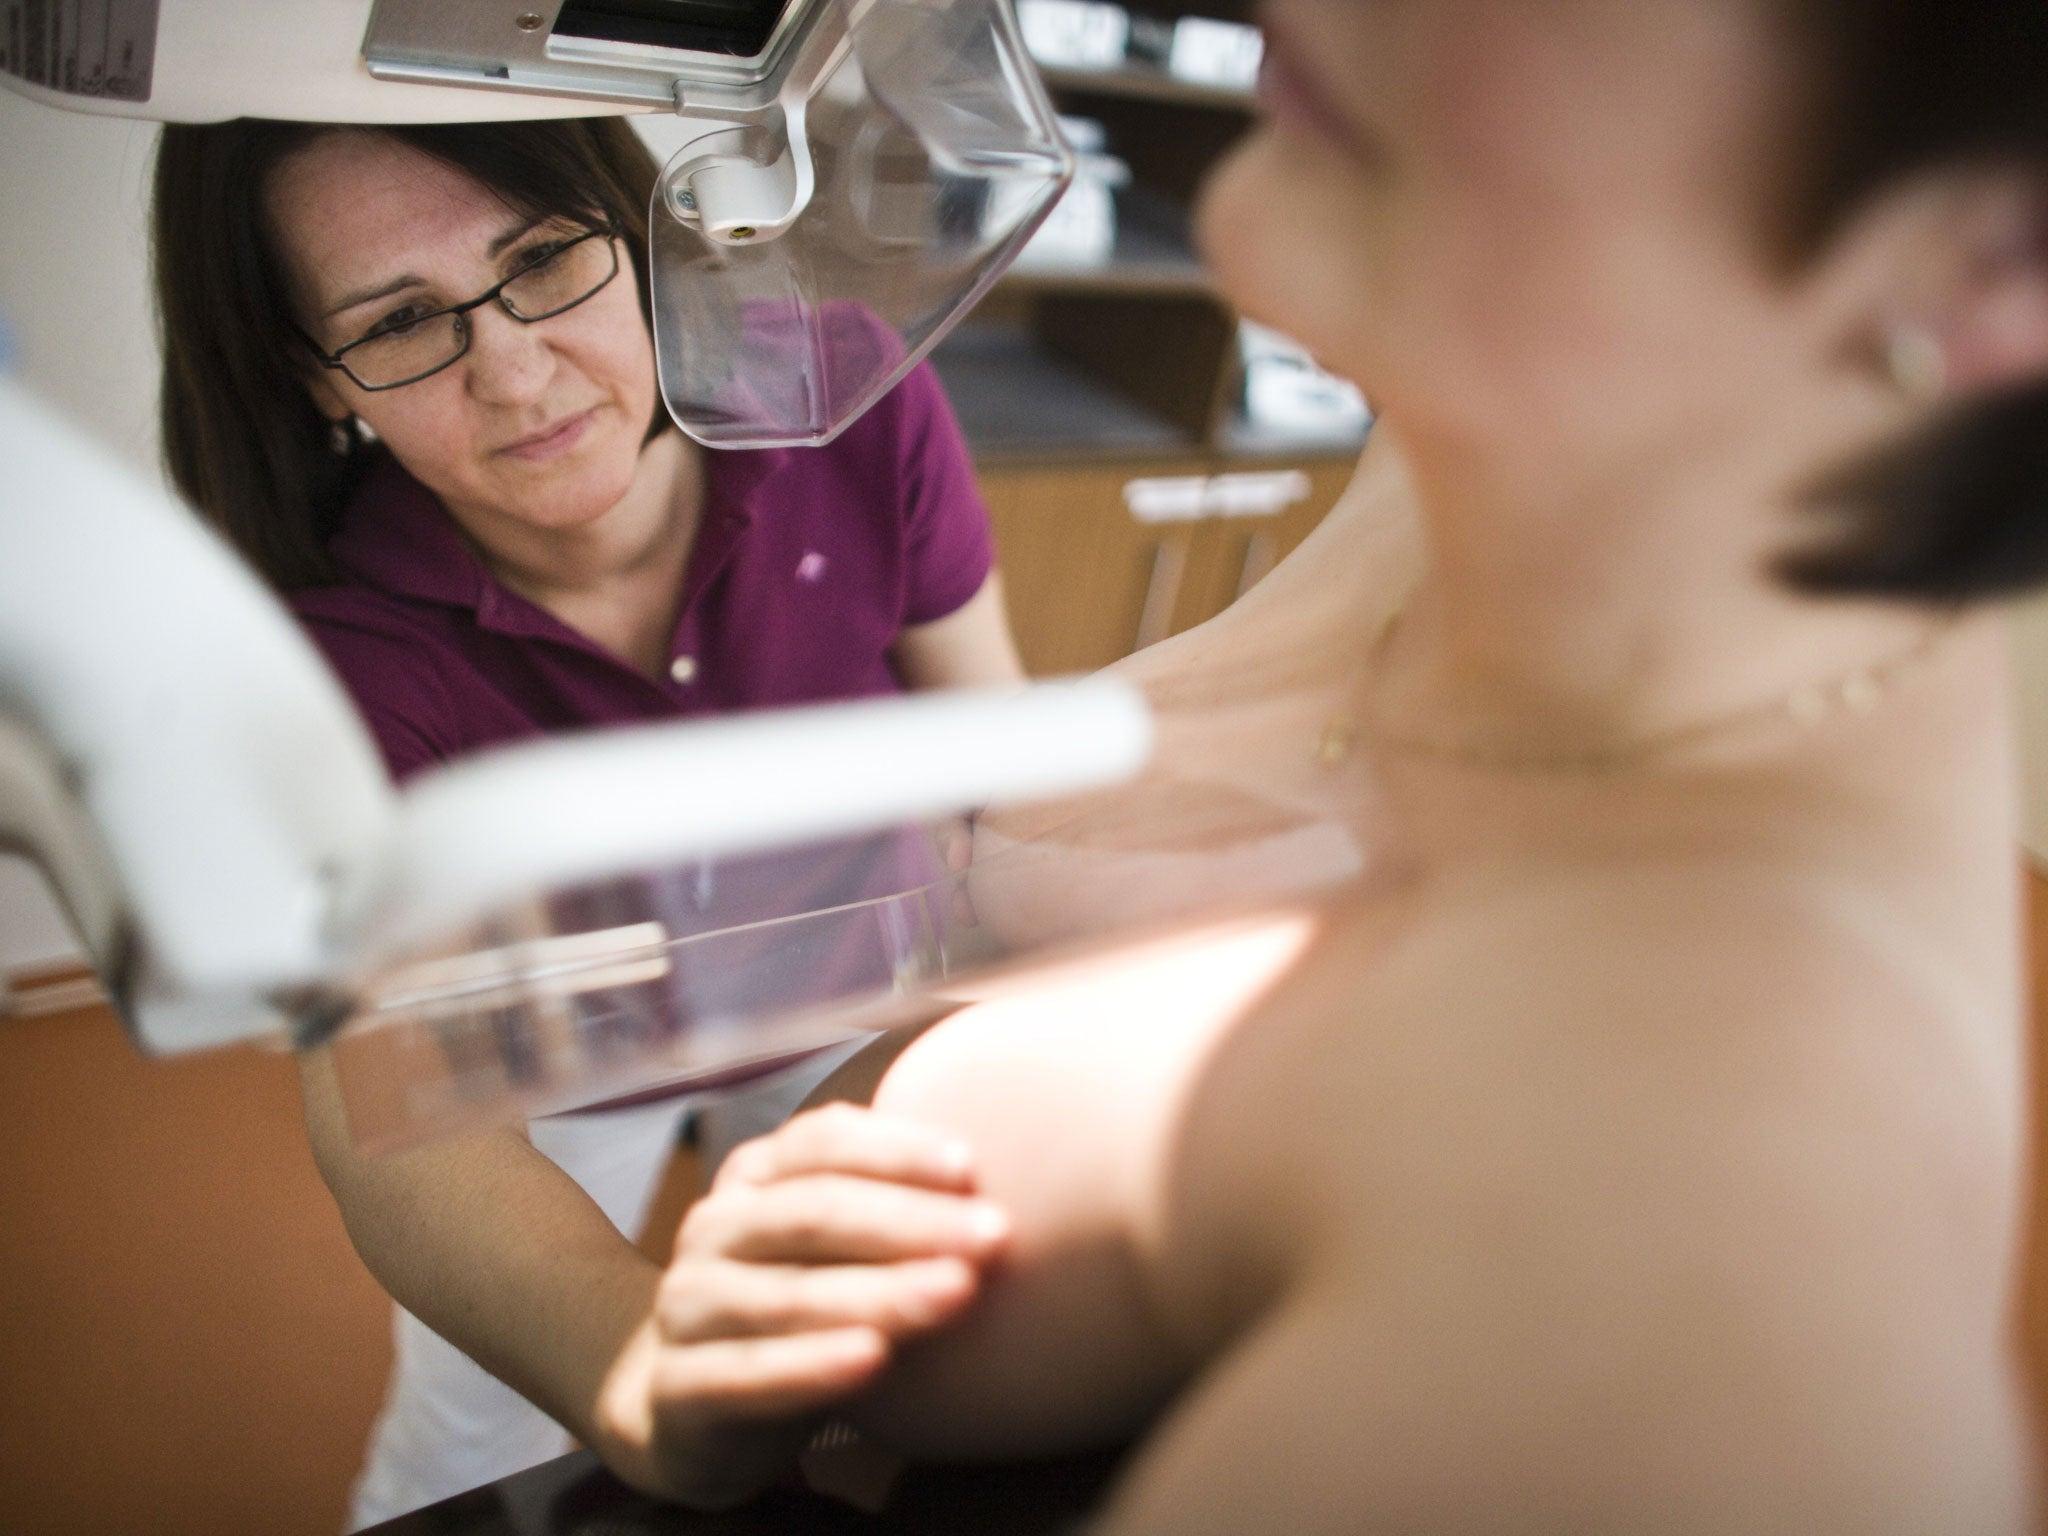 'Extremely concerning' number of doctors unaware of life-saving breast cancer drug